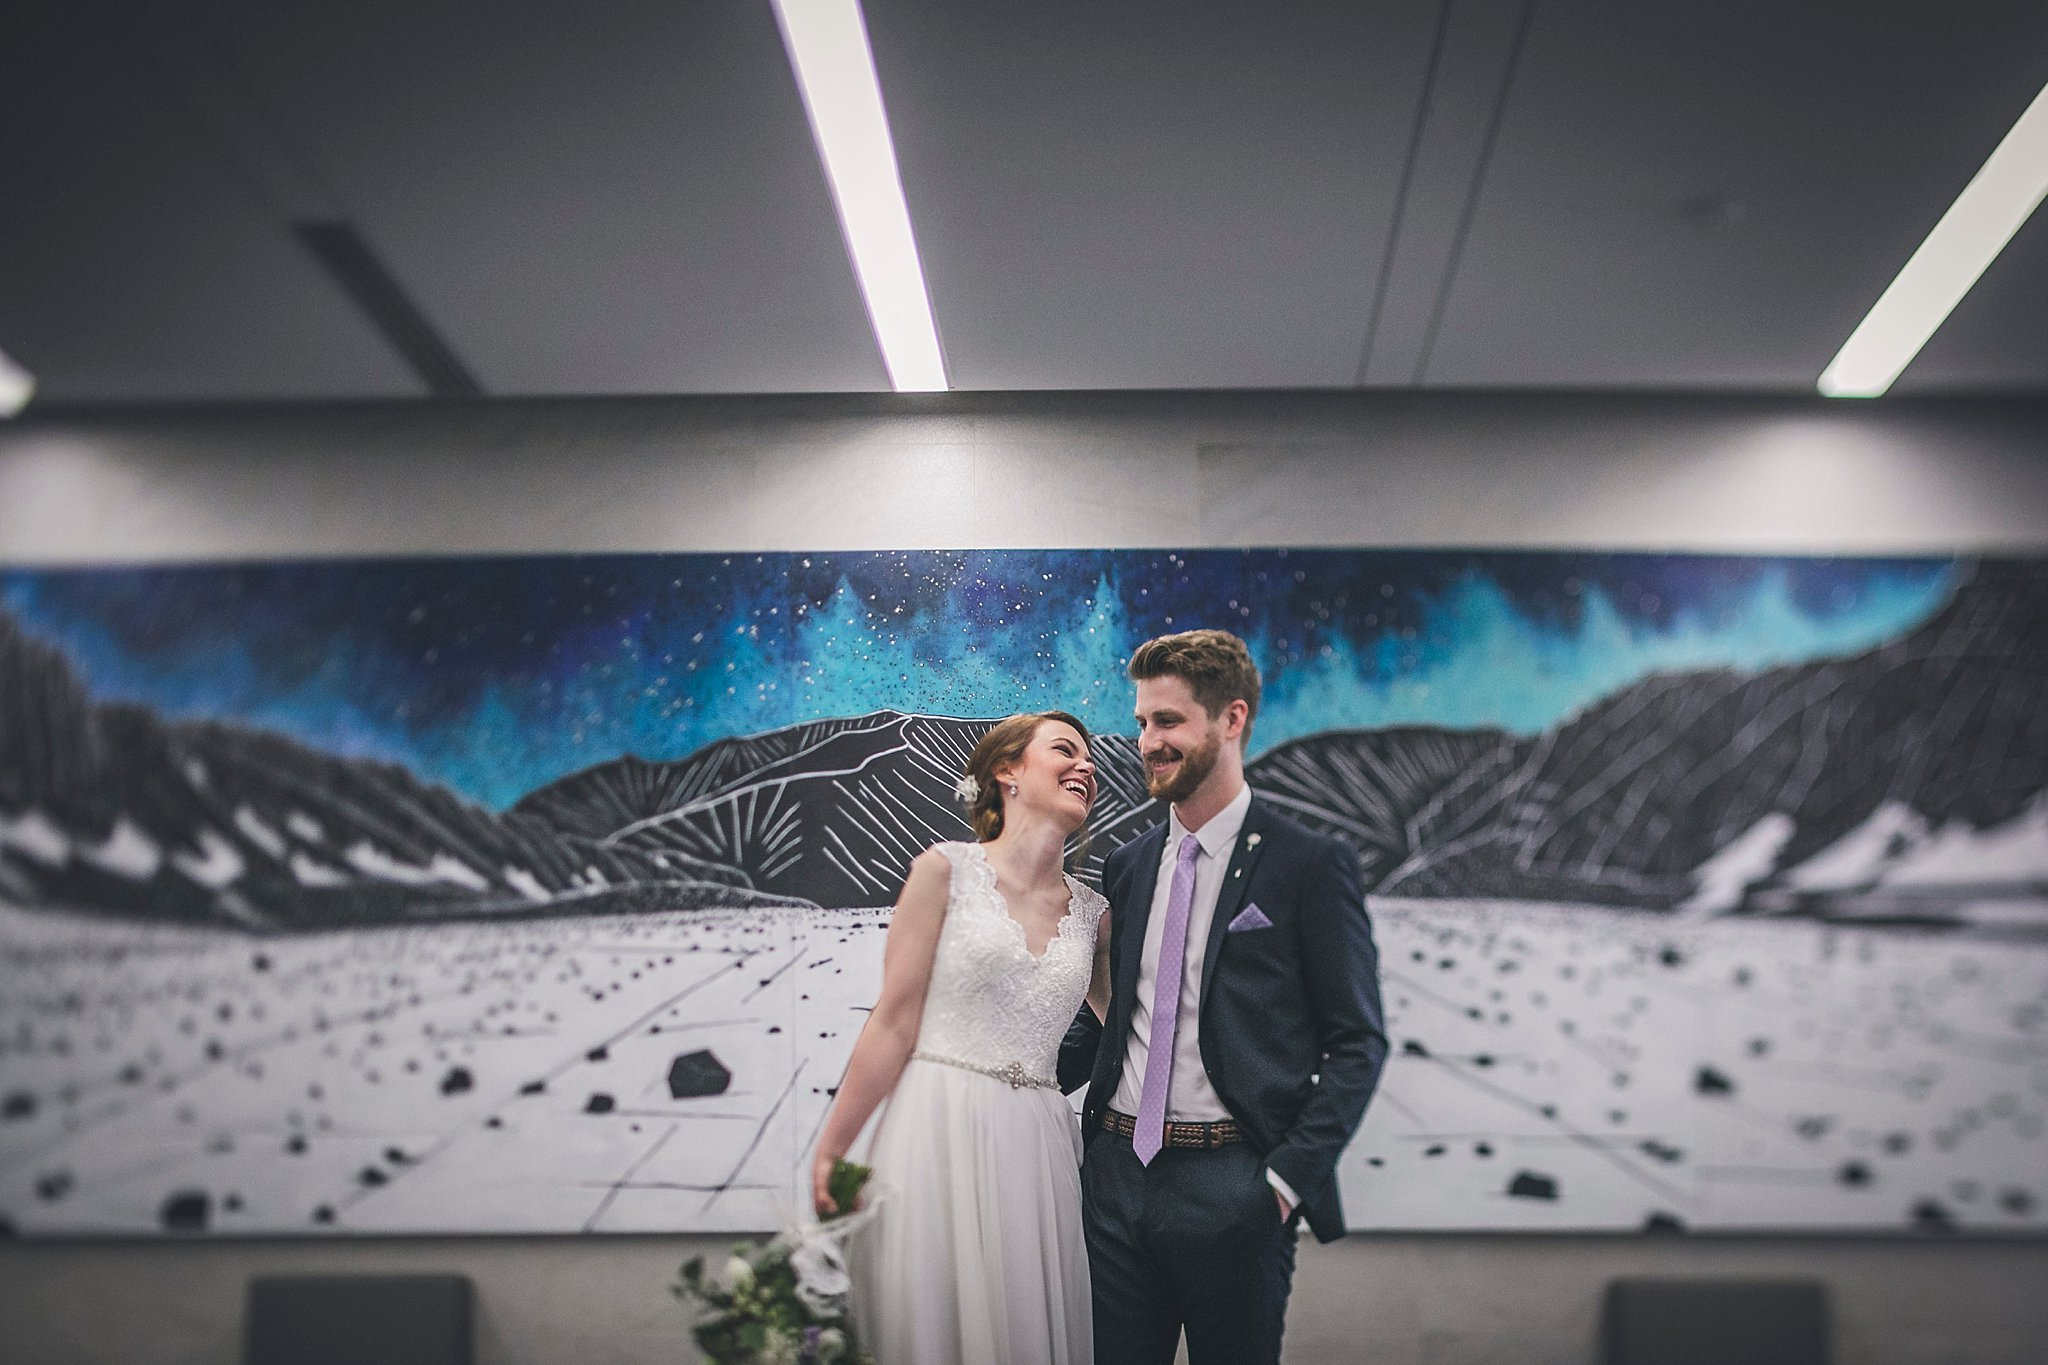 Bride and groom portraits during a St. John's, Newfoundland wedding